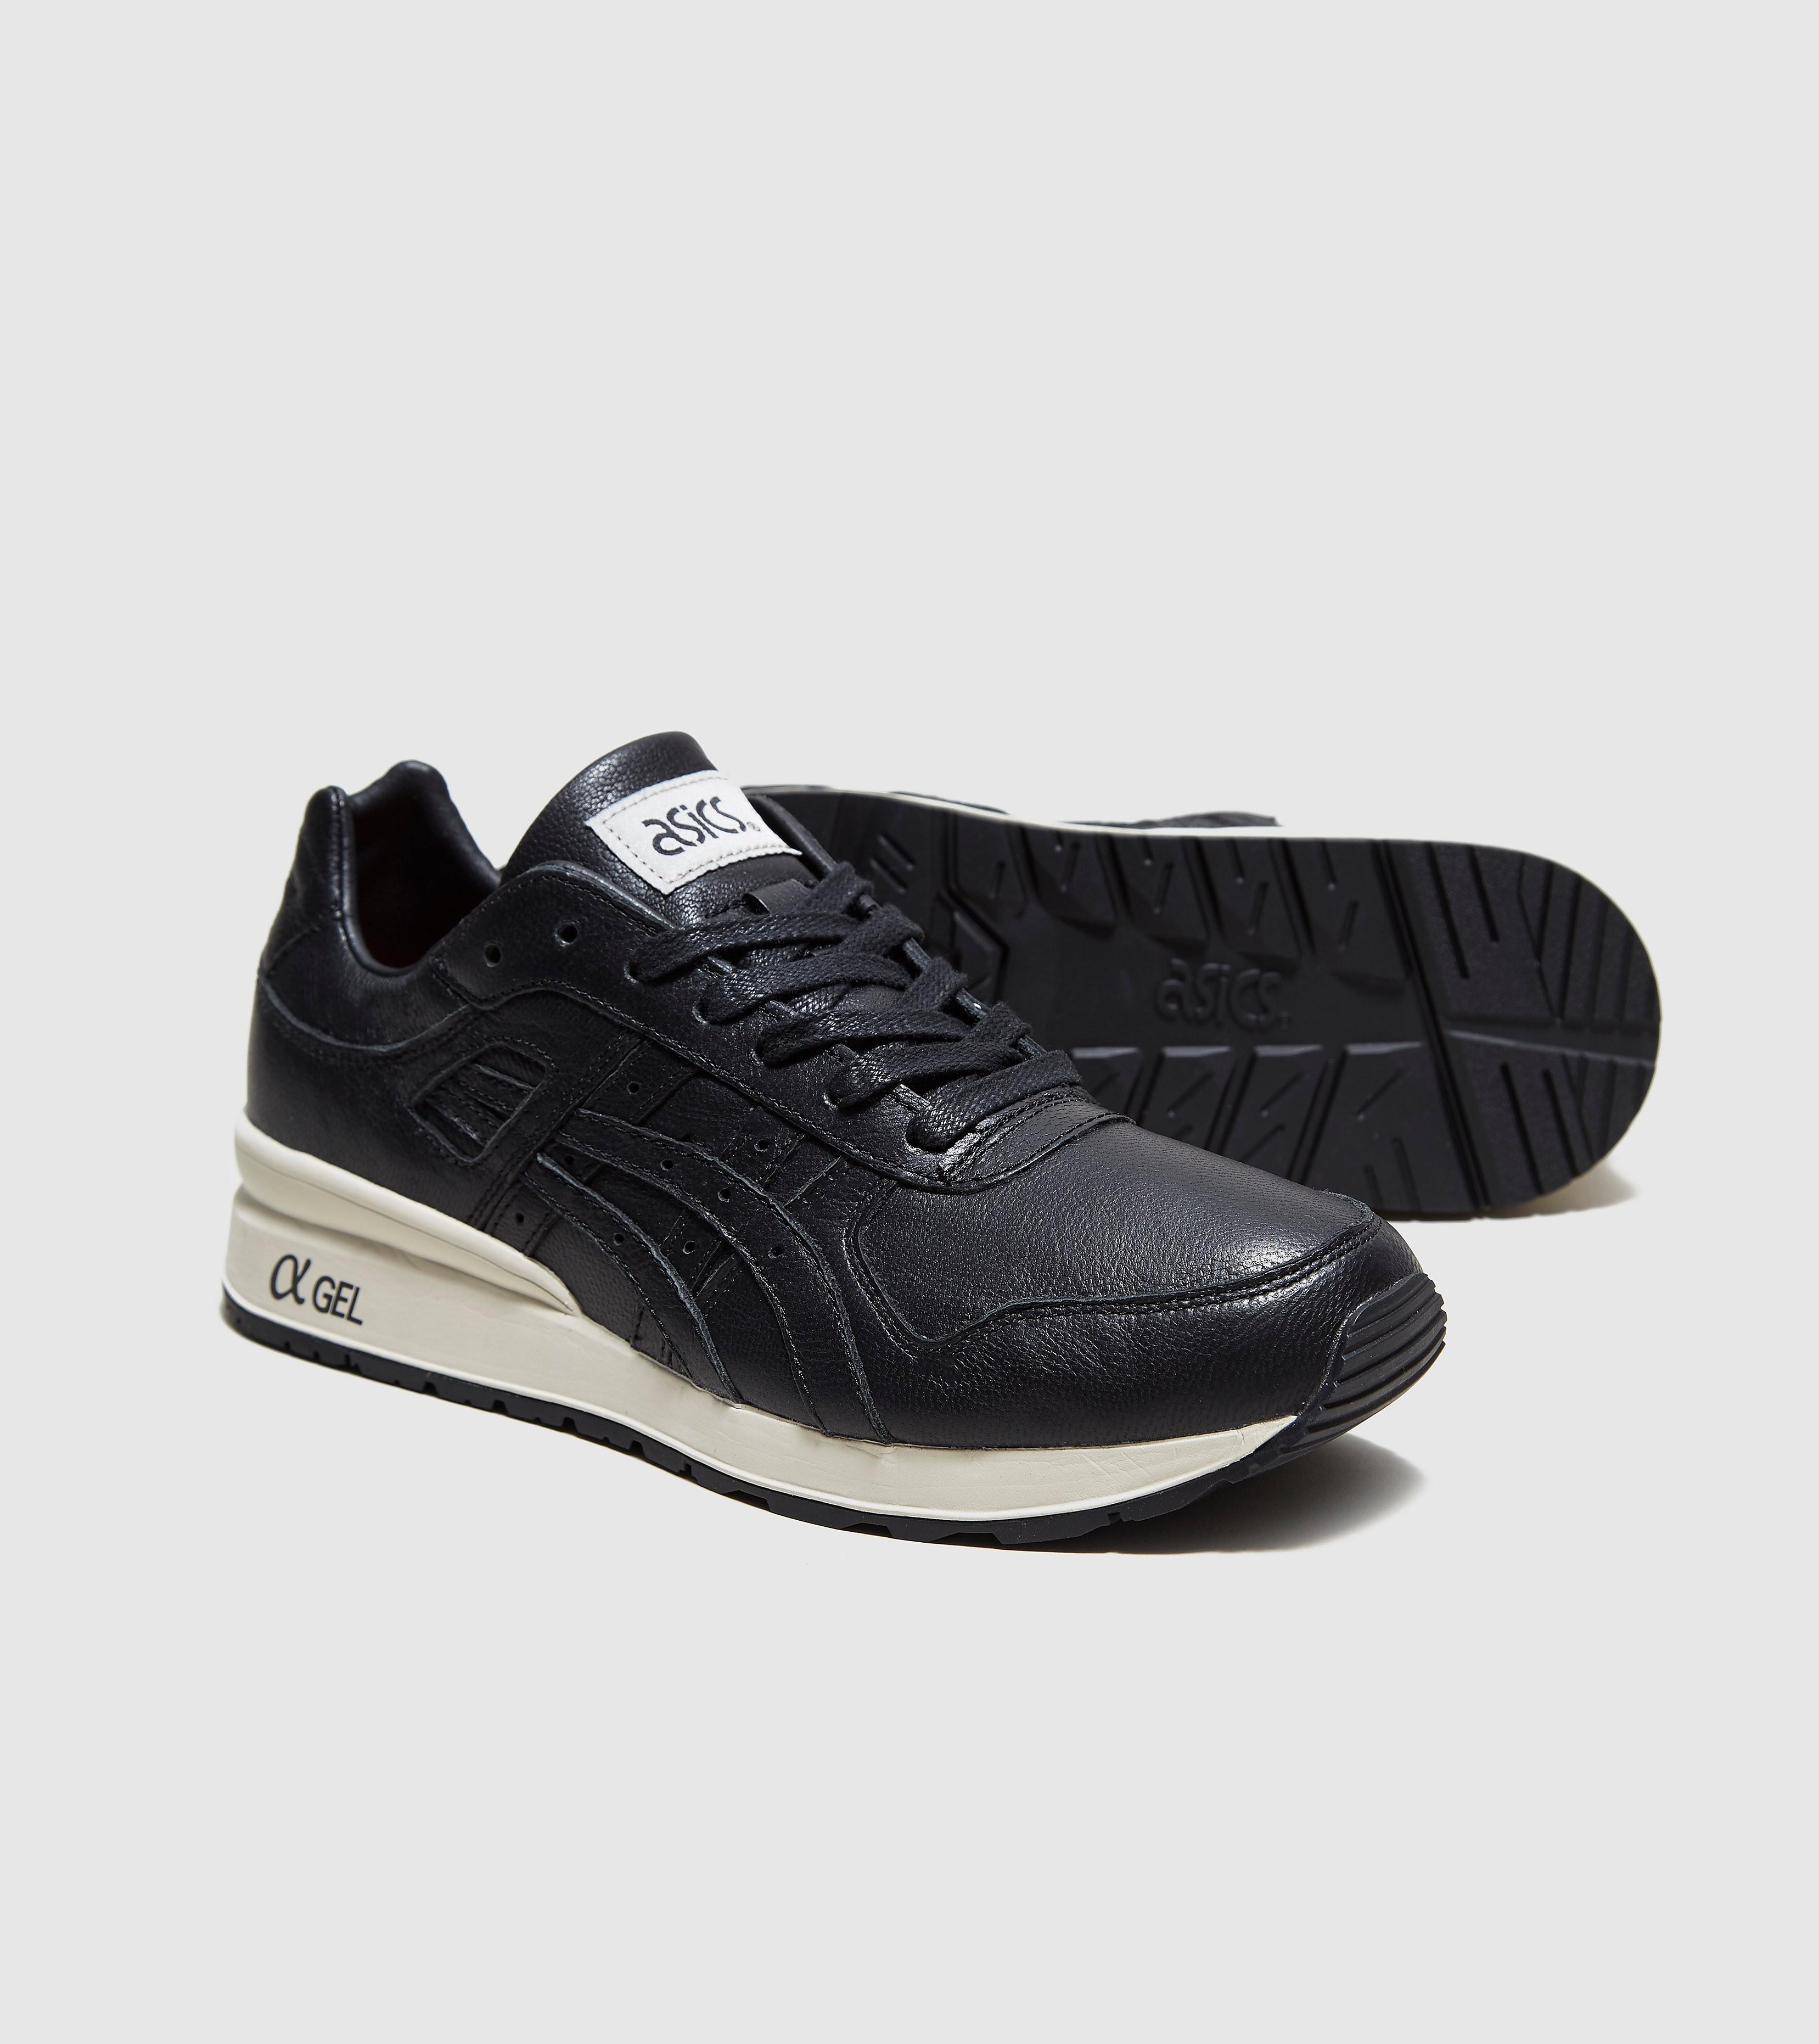 ASICS GT-II Leather